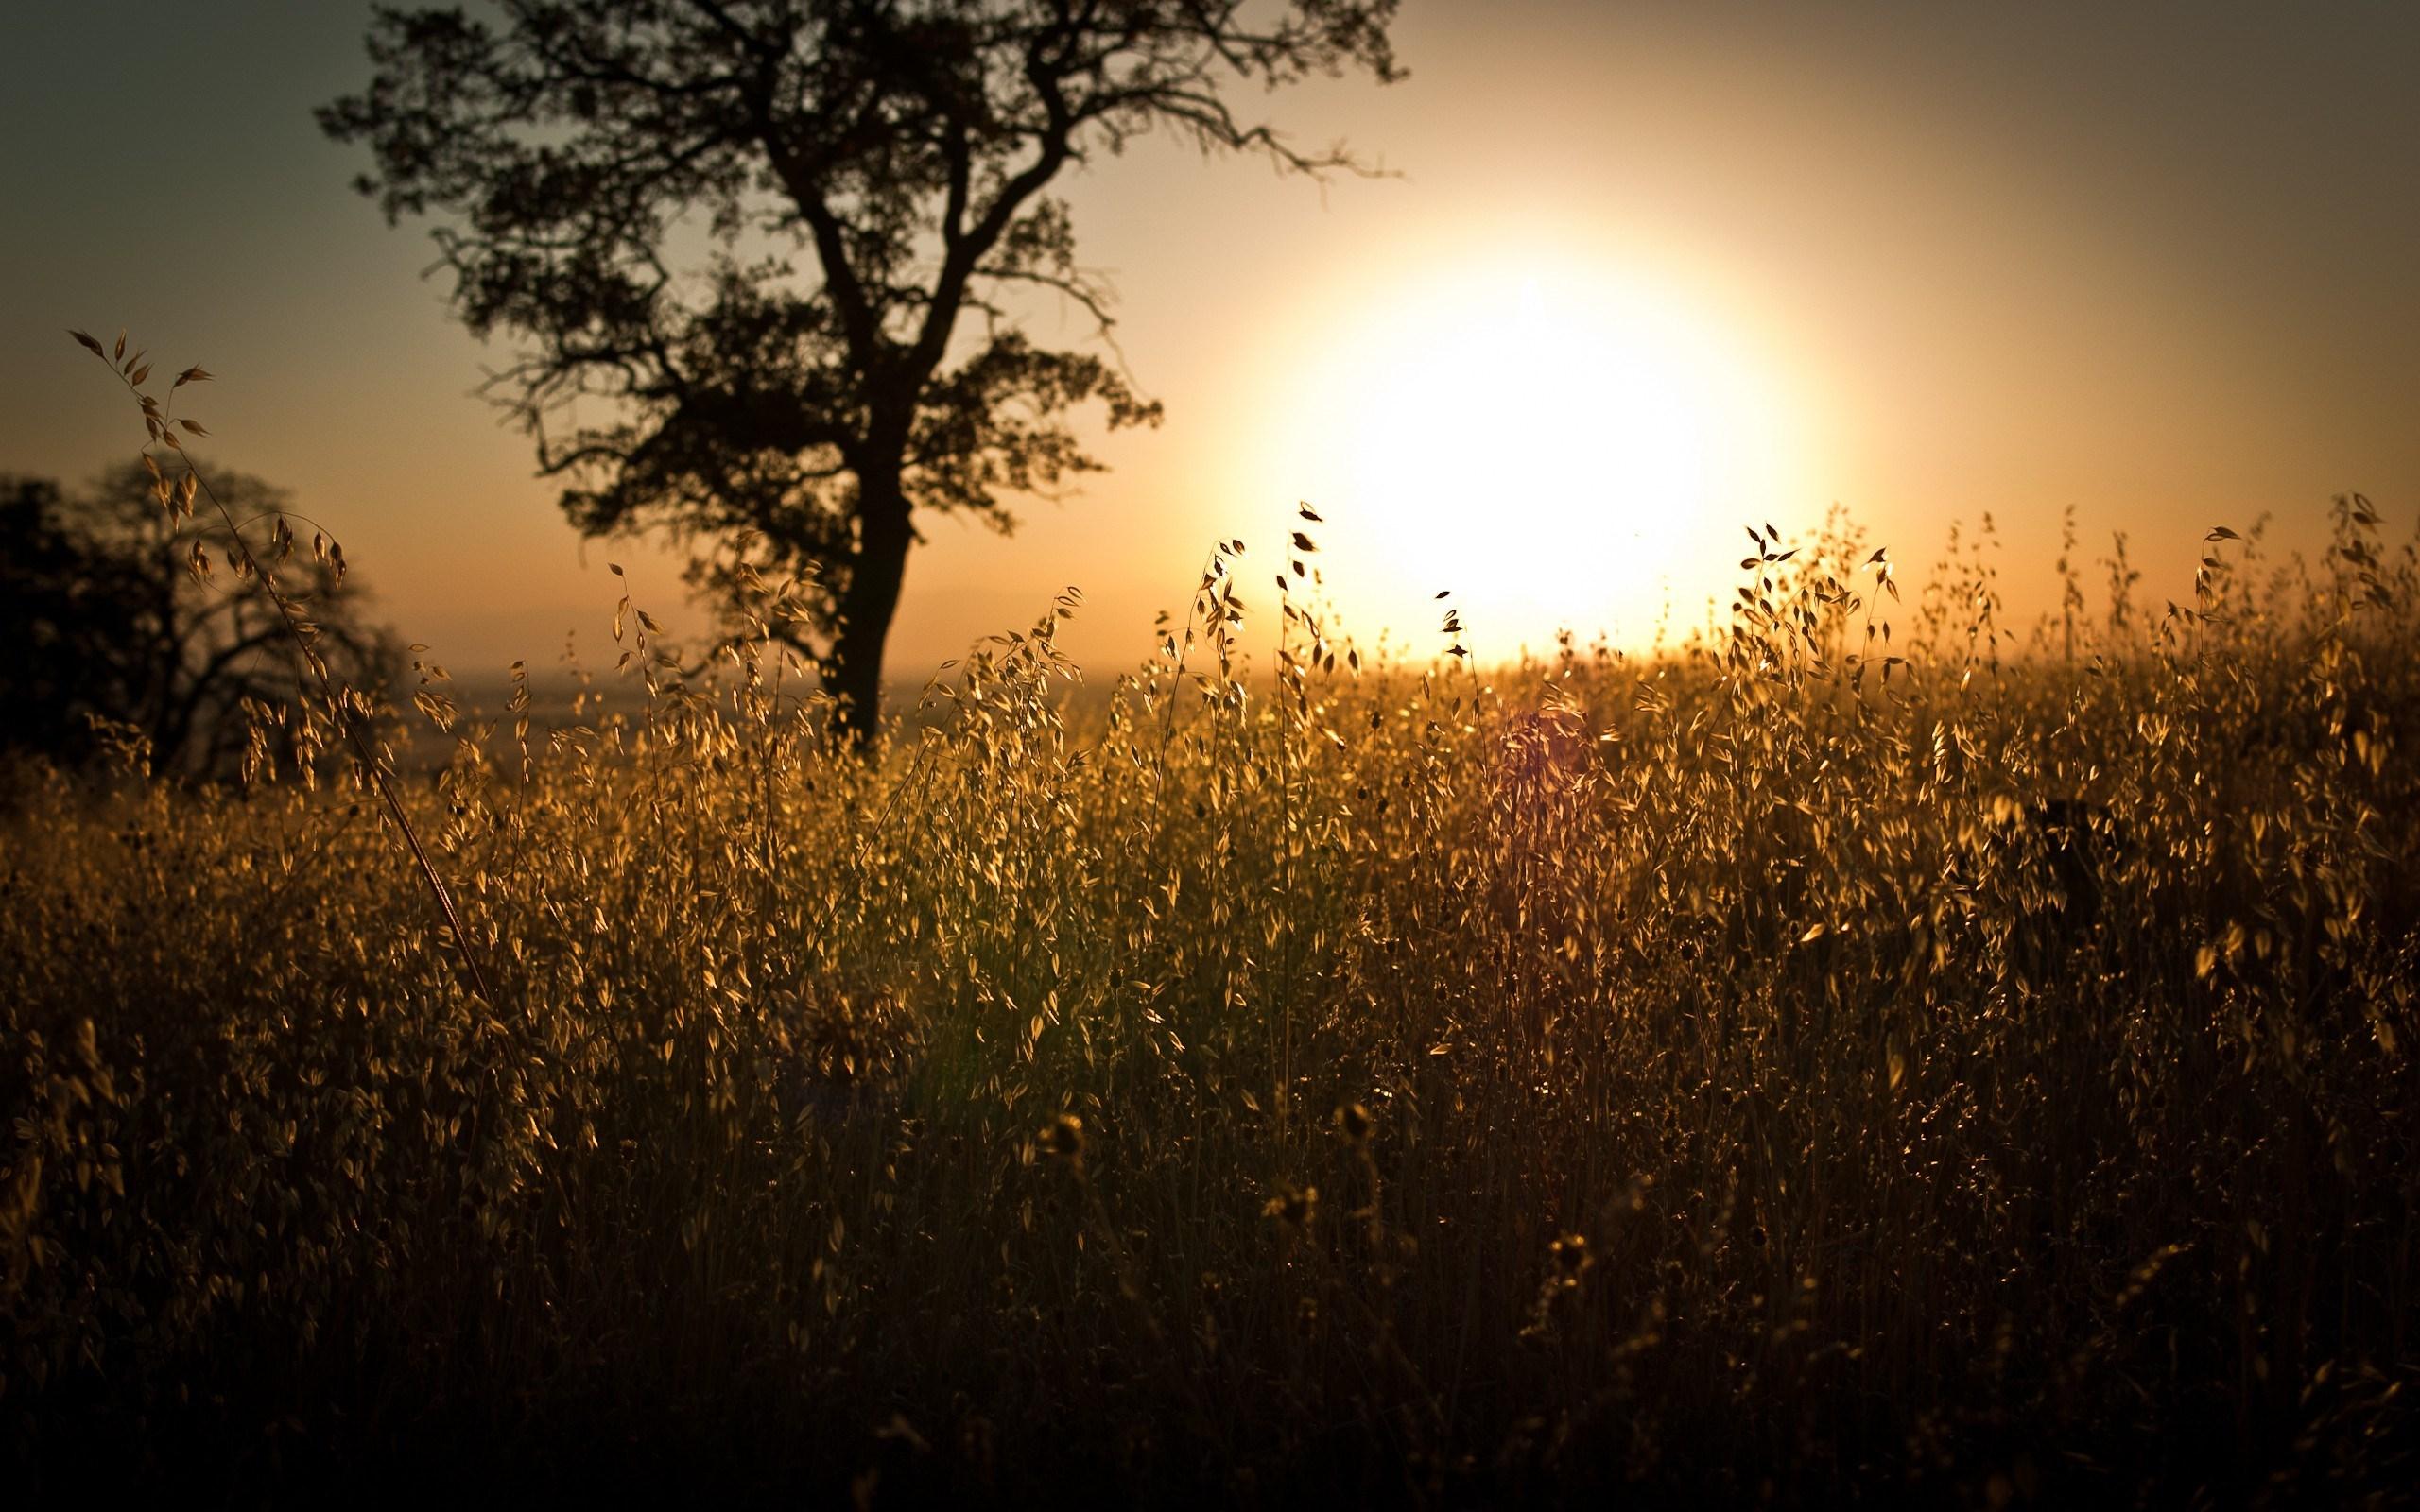 Sunset landscapes nature sun wallpaper 2560x1600 - Nature wallpaper 2560x1600 ...